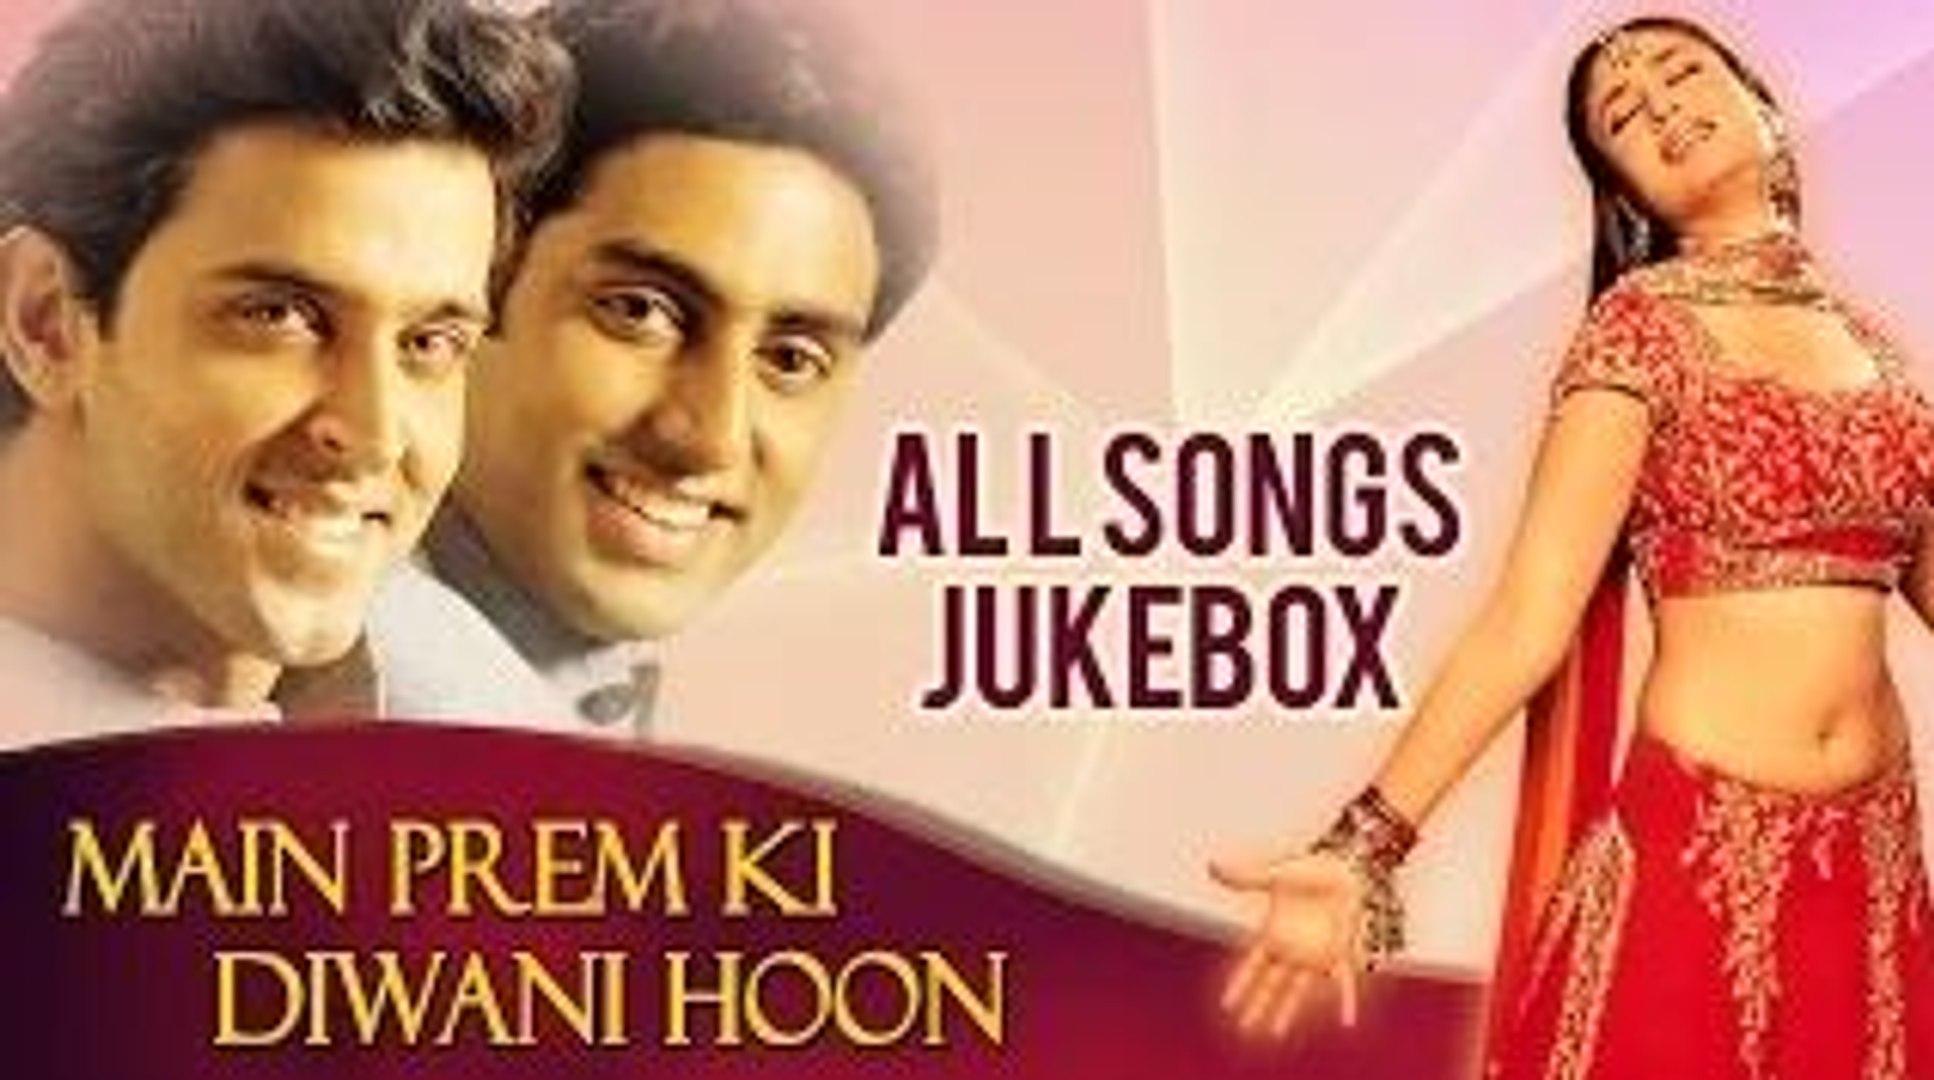 Main prem ki diwani hoon hindi dubbed movie download transoft.